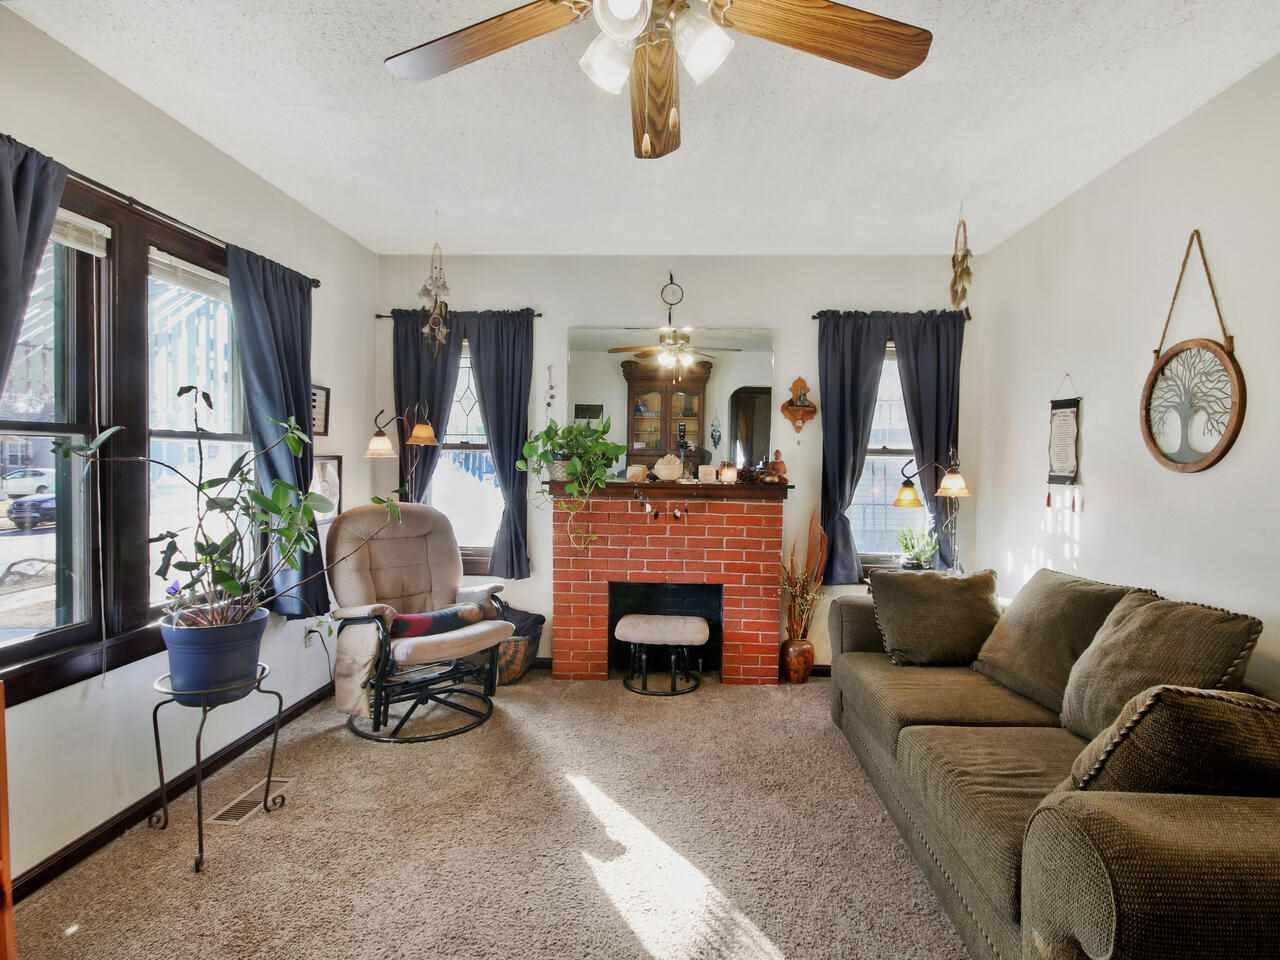 For Sale: 359 N EDWARDS AVE, Wichita KS